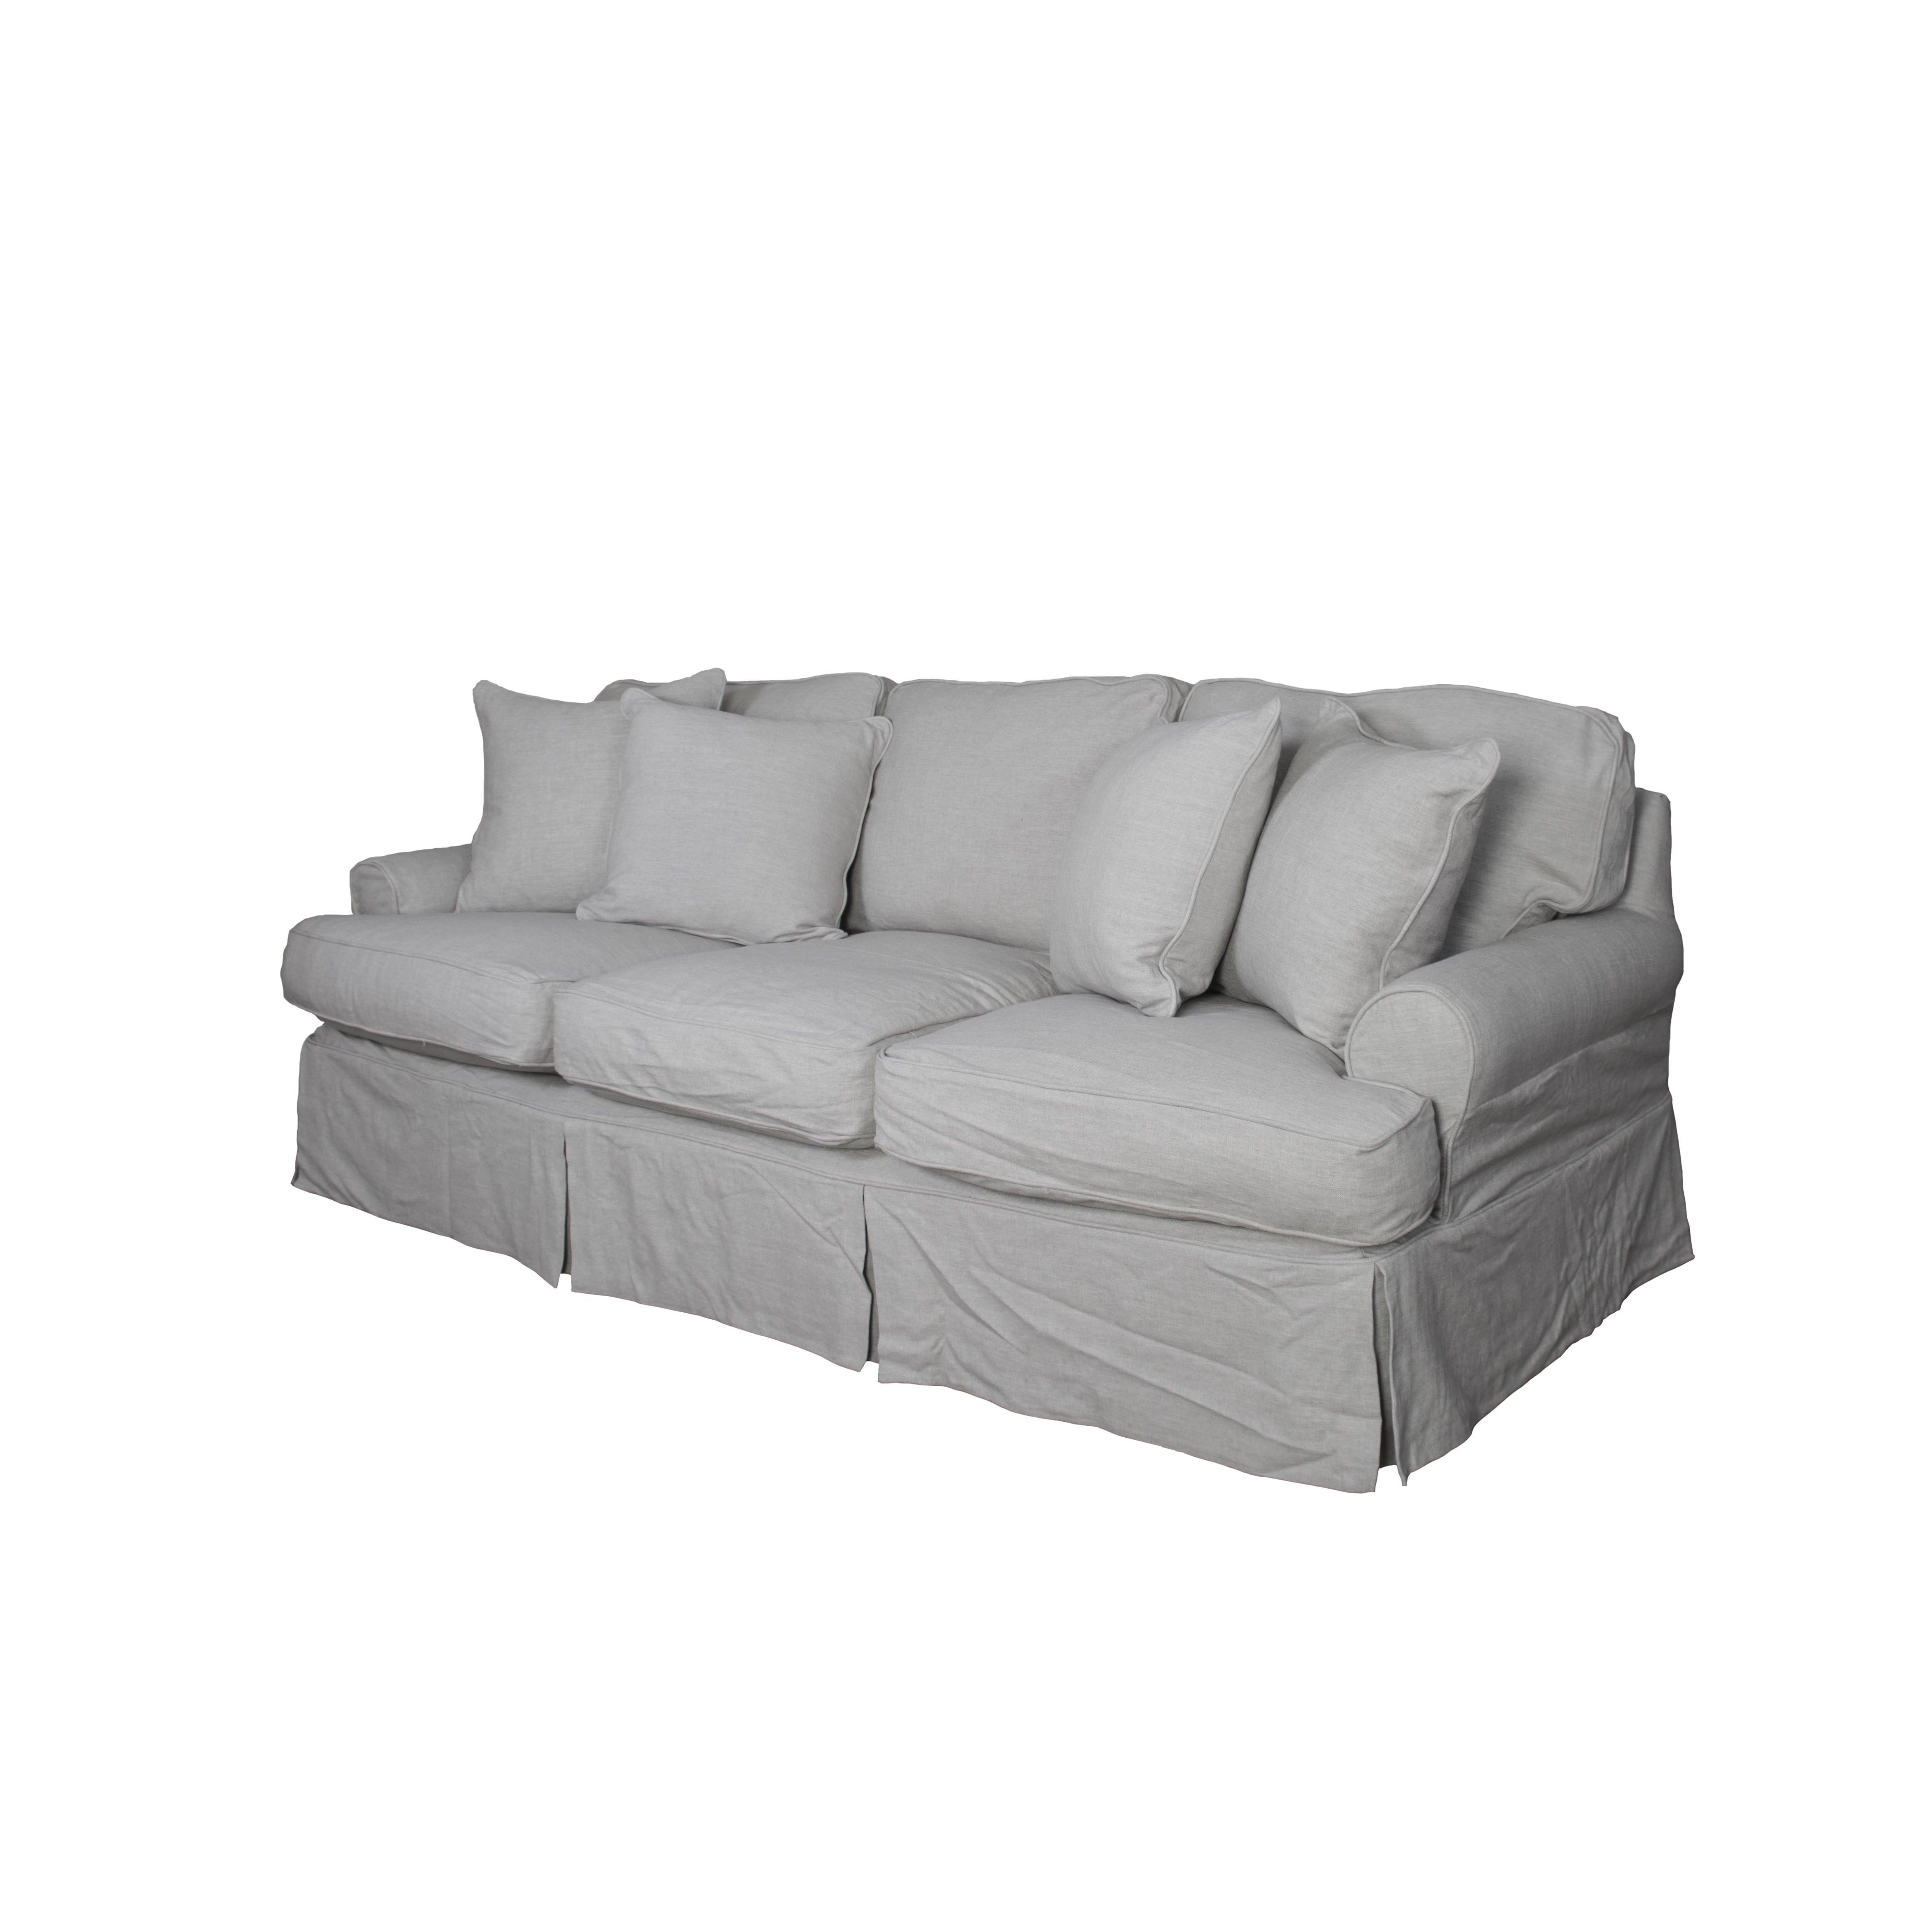 August Grove Callie T Cushion Sofa Slipcover & Reviews | Wayfair In Callie Sofa Chairs (Image 2 of 25)